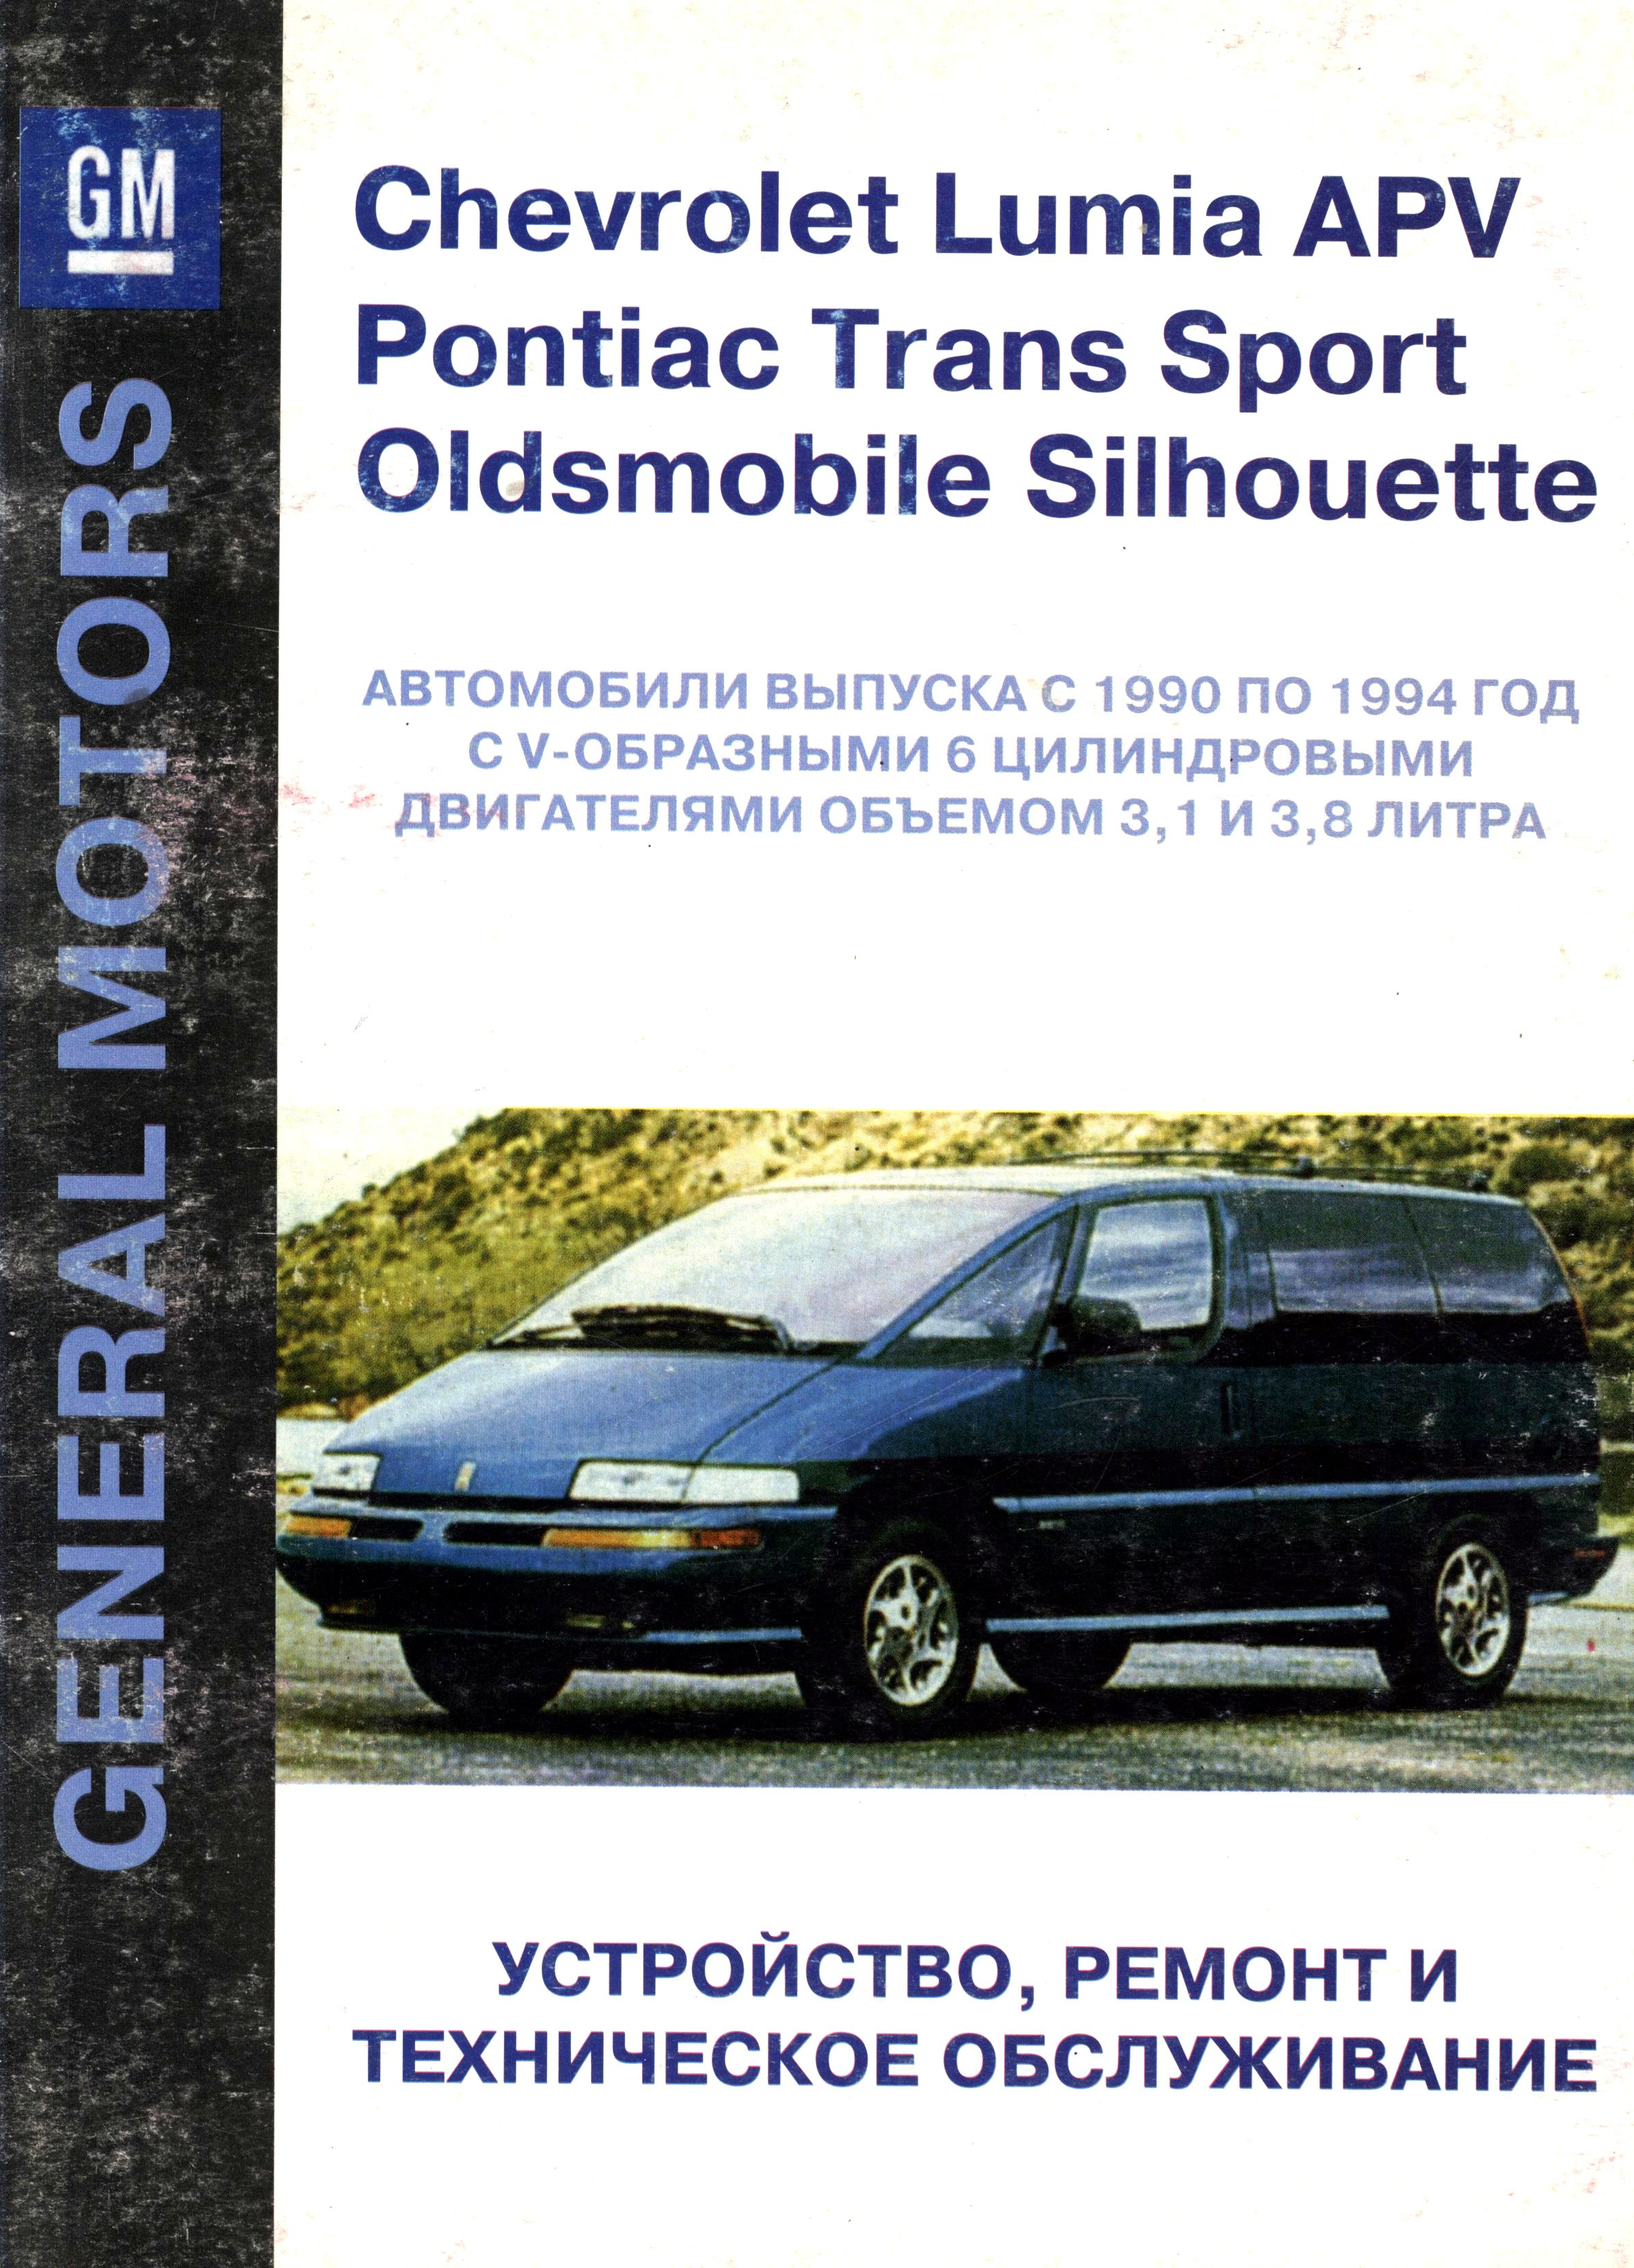 CHEVROLET LUMINA 1990-1994 Руководство по ремонту и эксплуатации